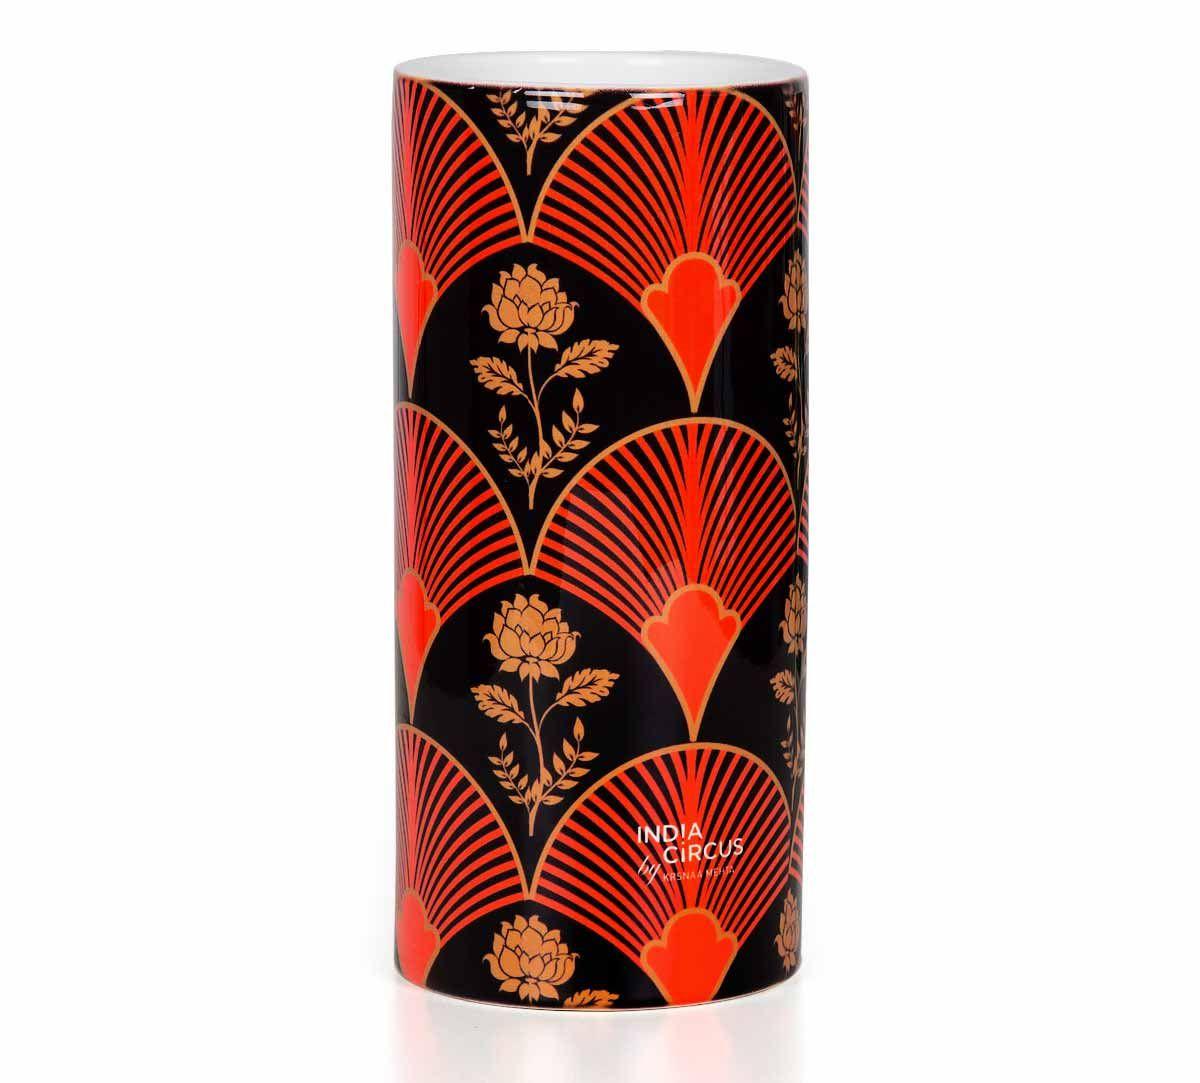 Fans of Blossom Vase